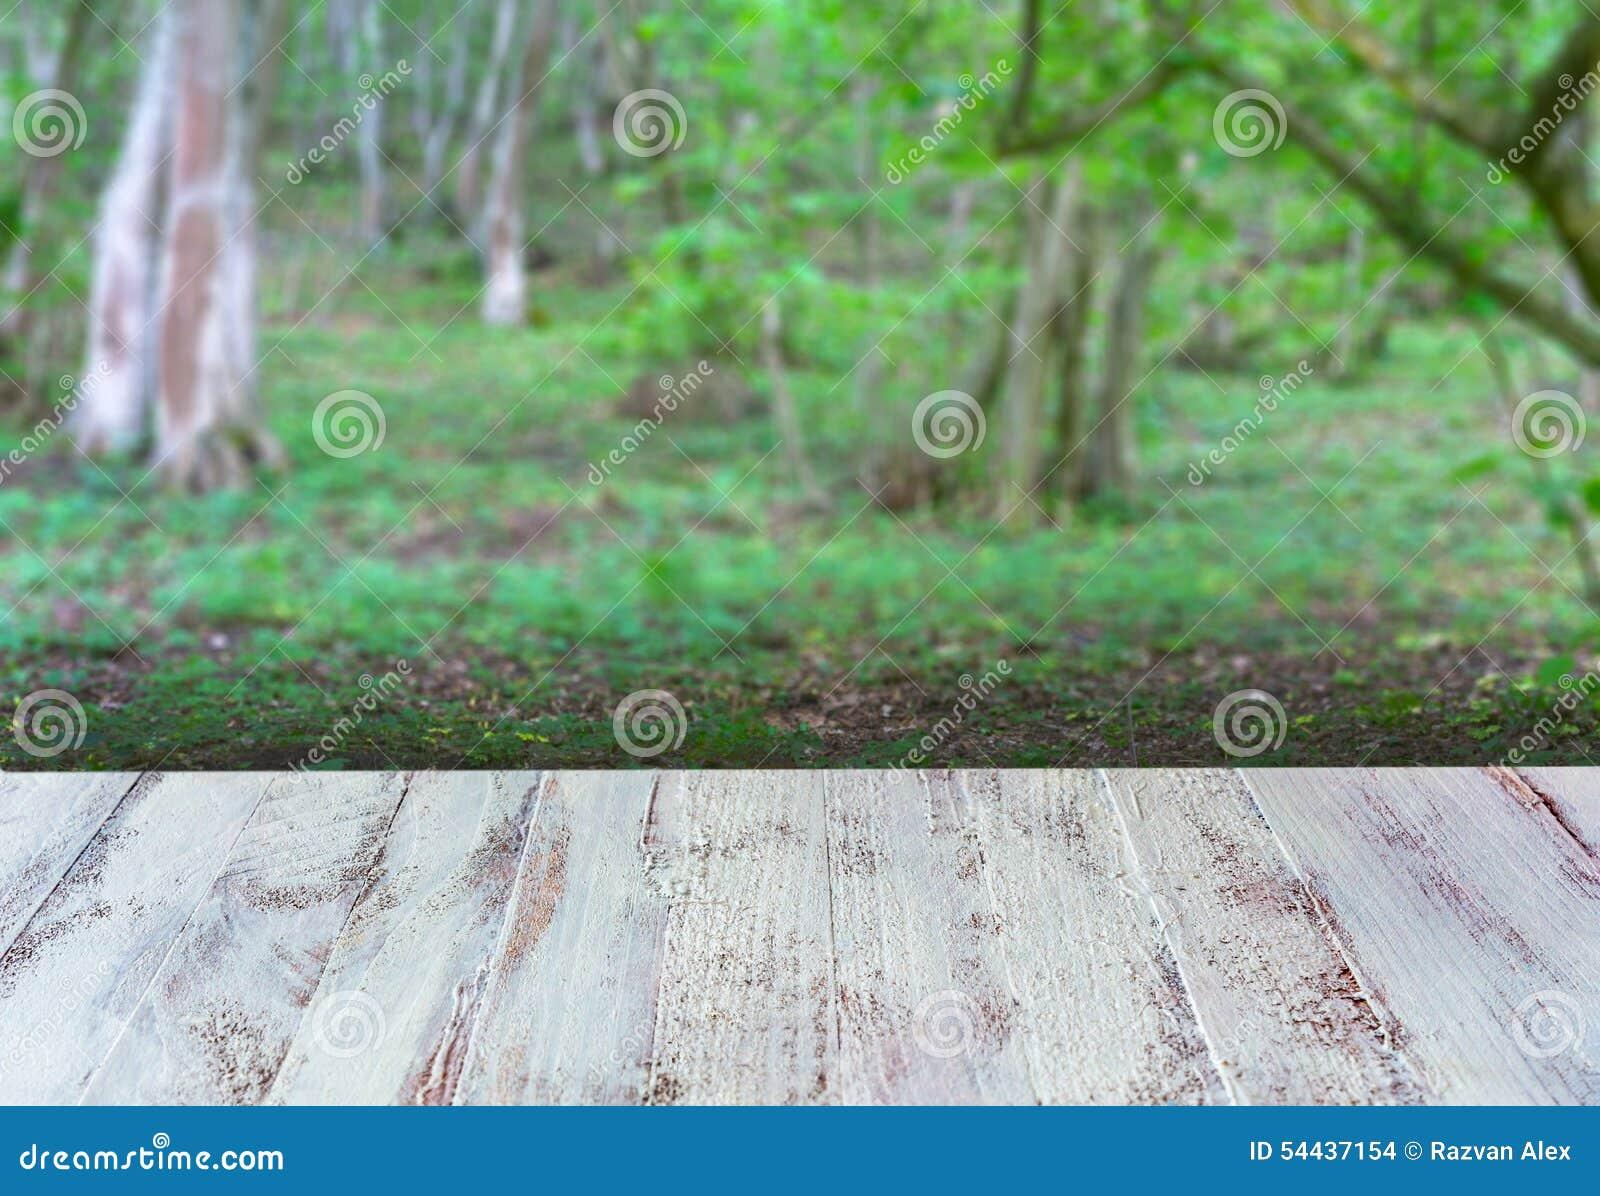 wit tafelblad met forest background stock foto - afbeelding: 54437154